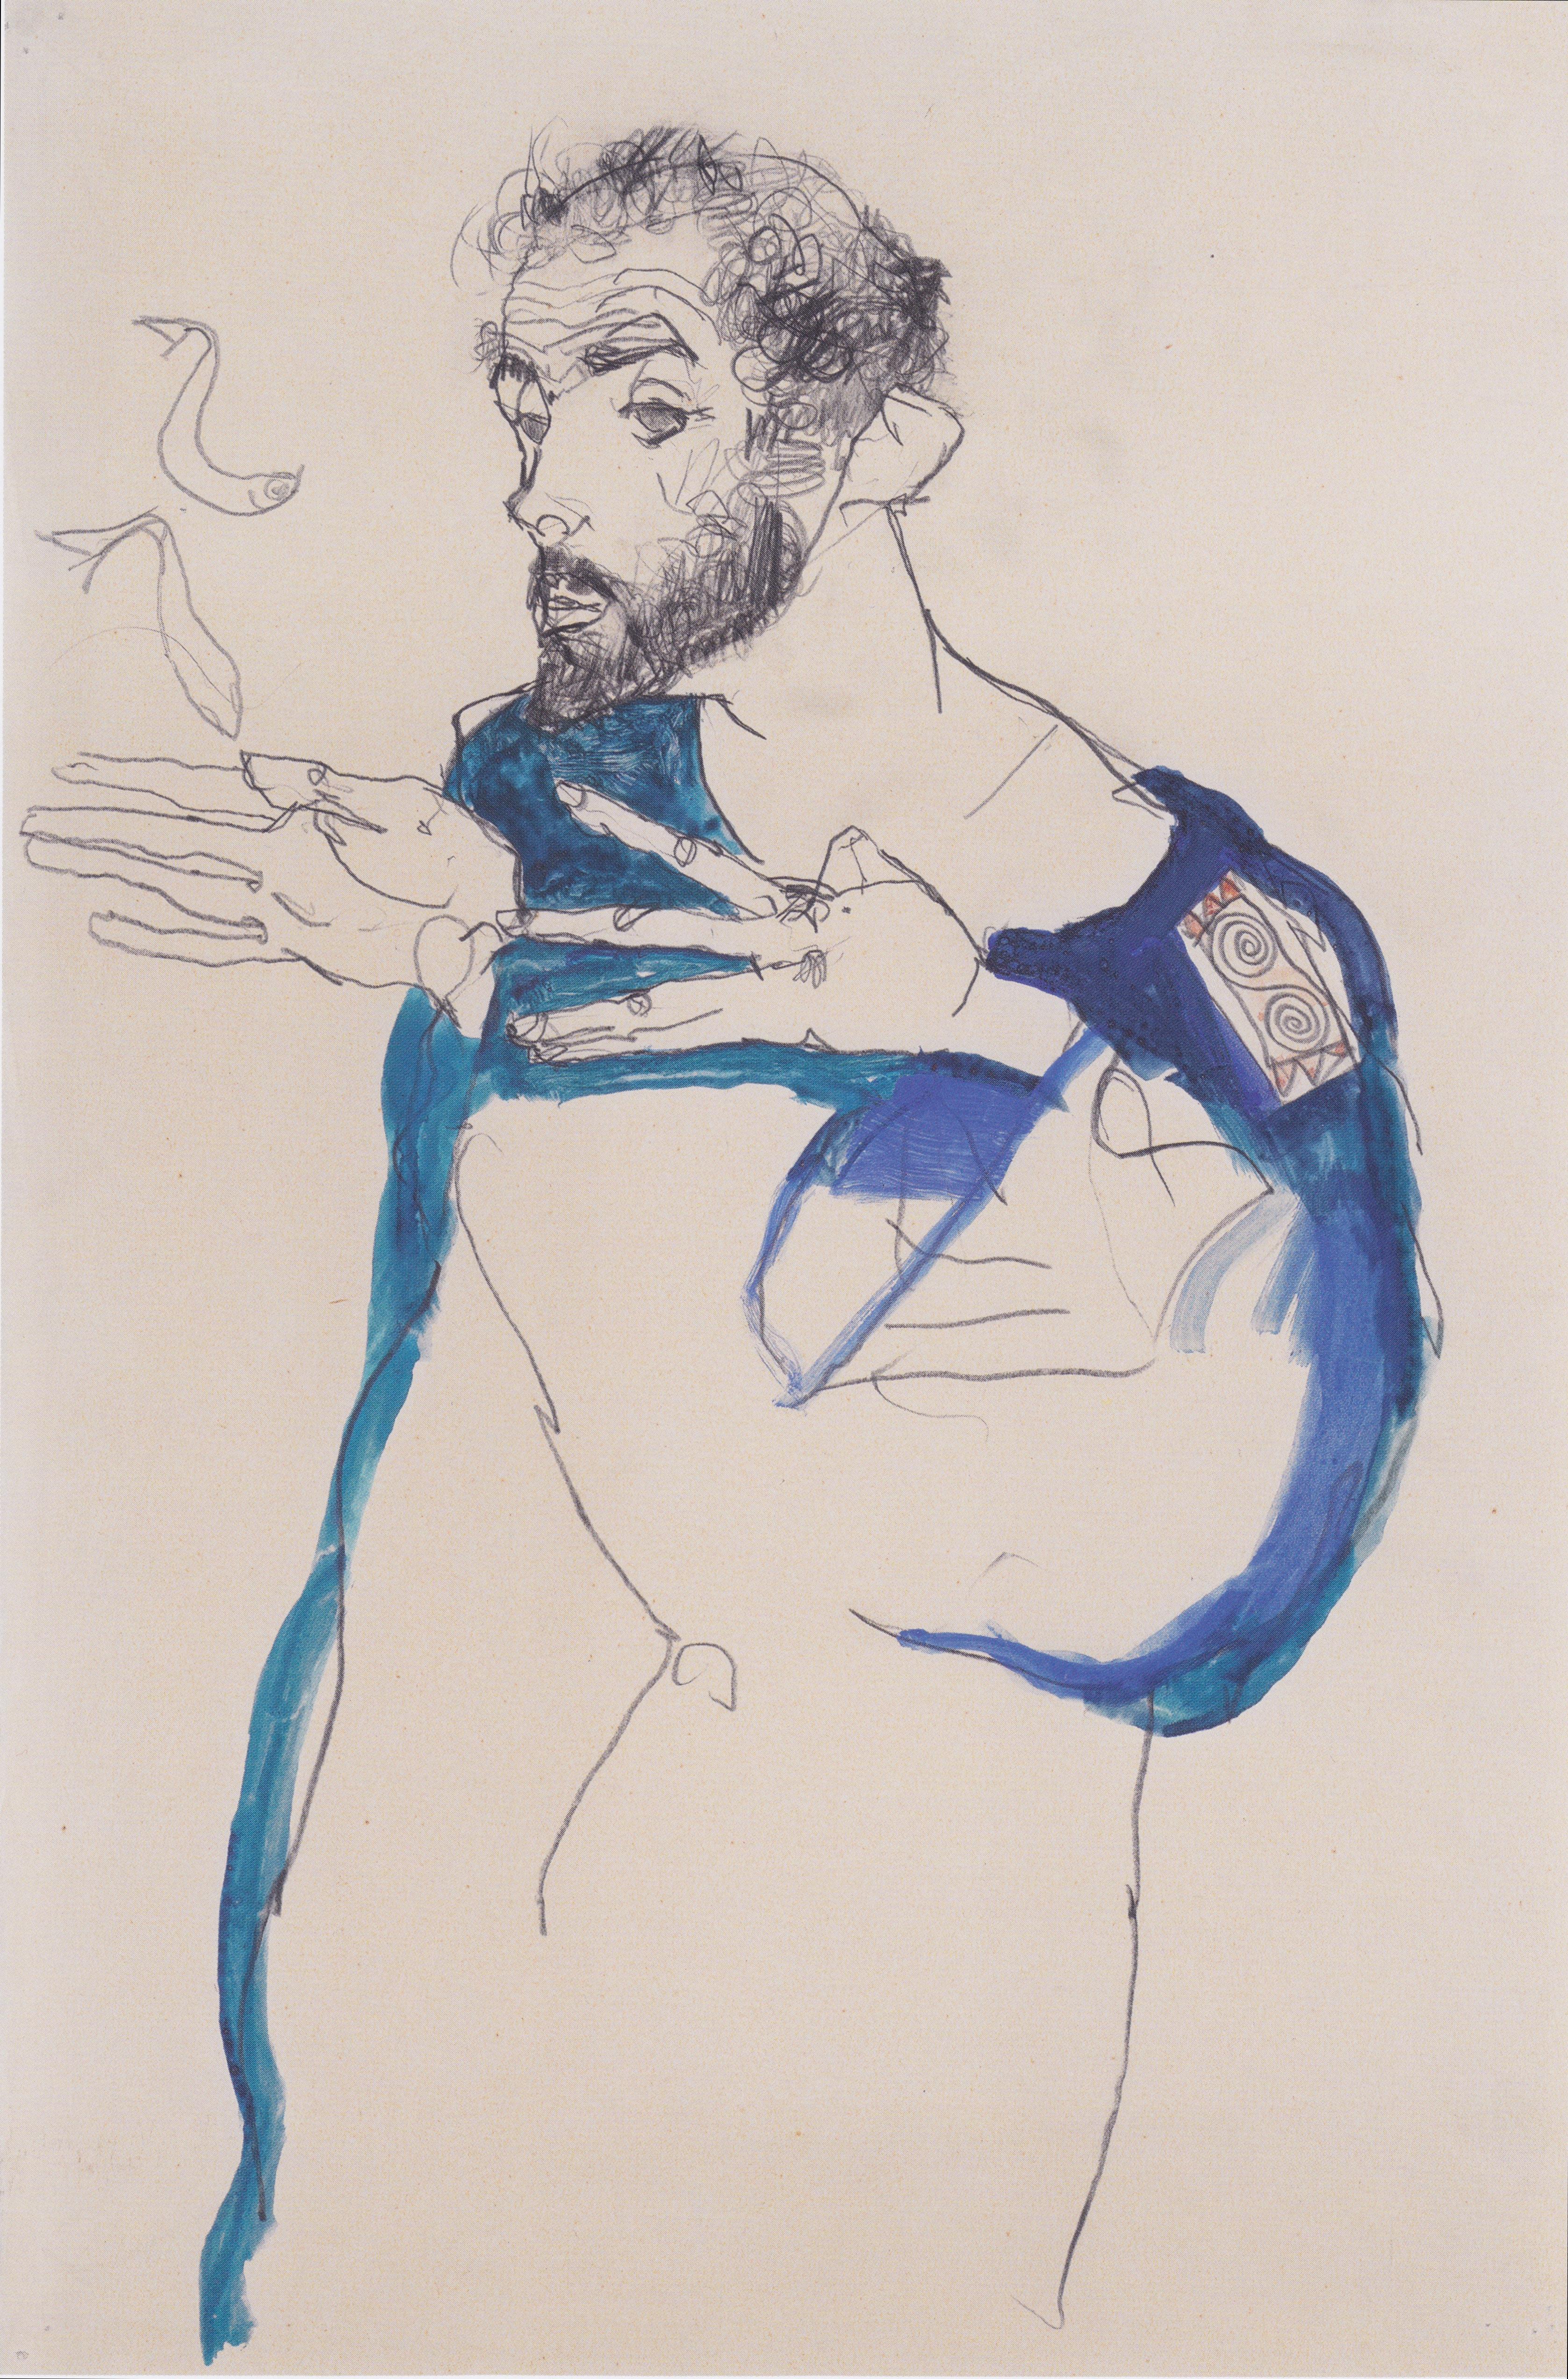 http://upload.wikimedia.org/wikipedia/commons/5/58/Egon_Schiele_-_Gustav_Klimt_im_blauen_Malerkittel_-_1913.jpeg